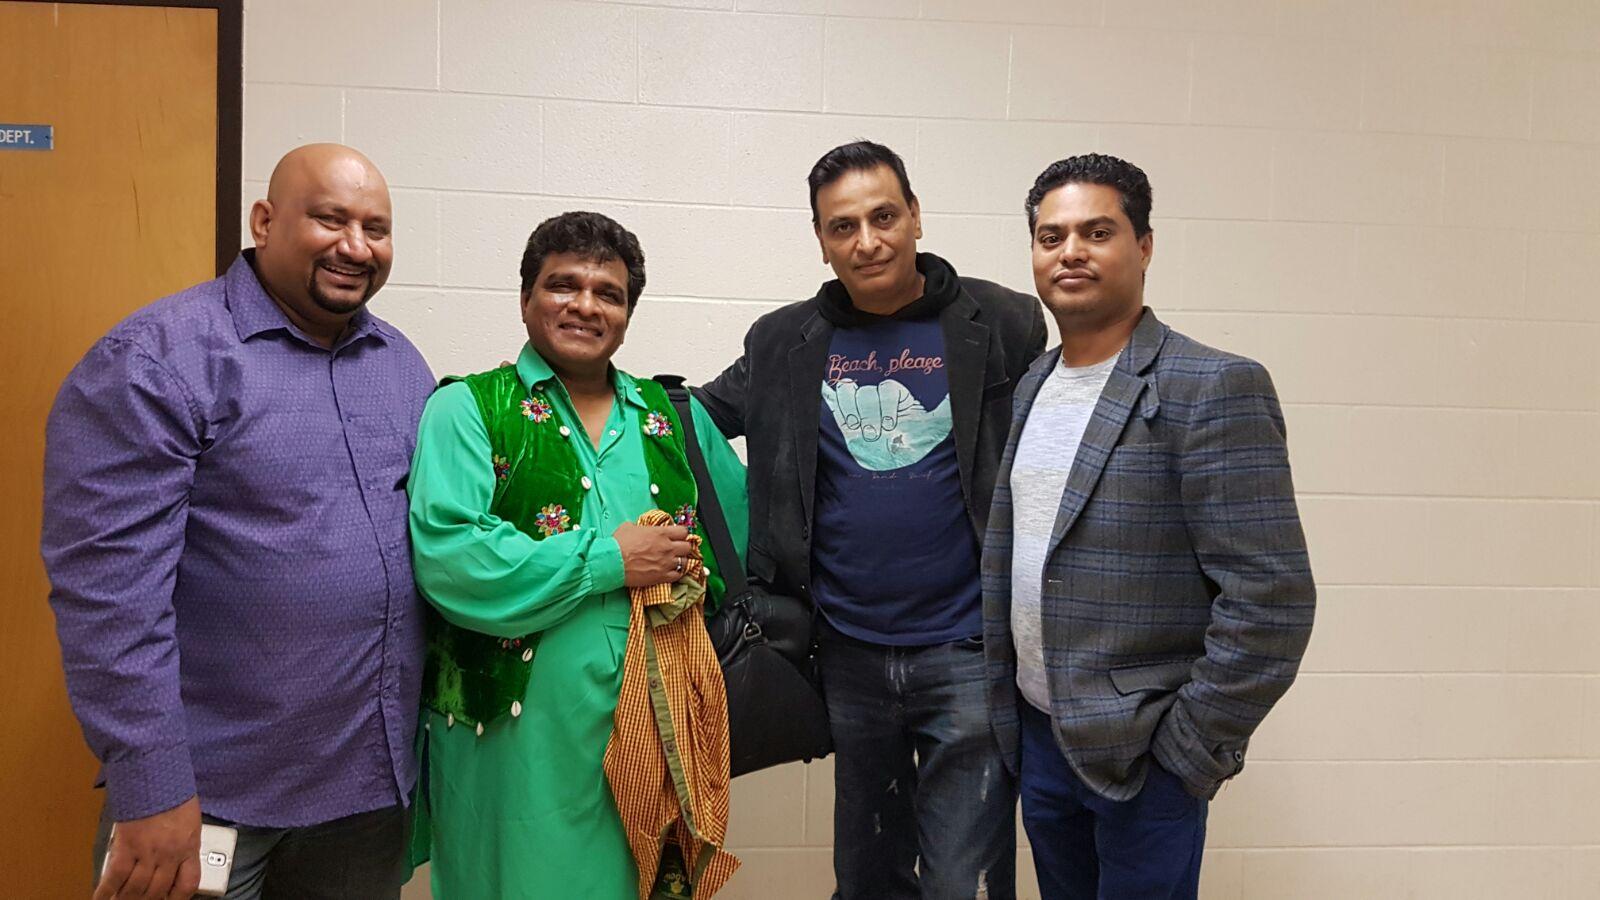 Apna Punjab TV - Leading Brampton, Canada based punjabi TV